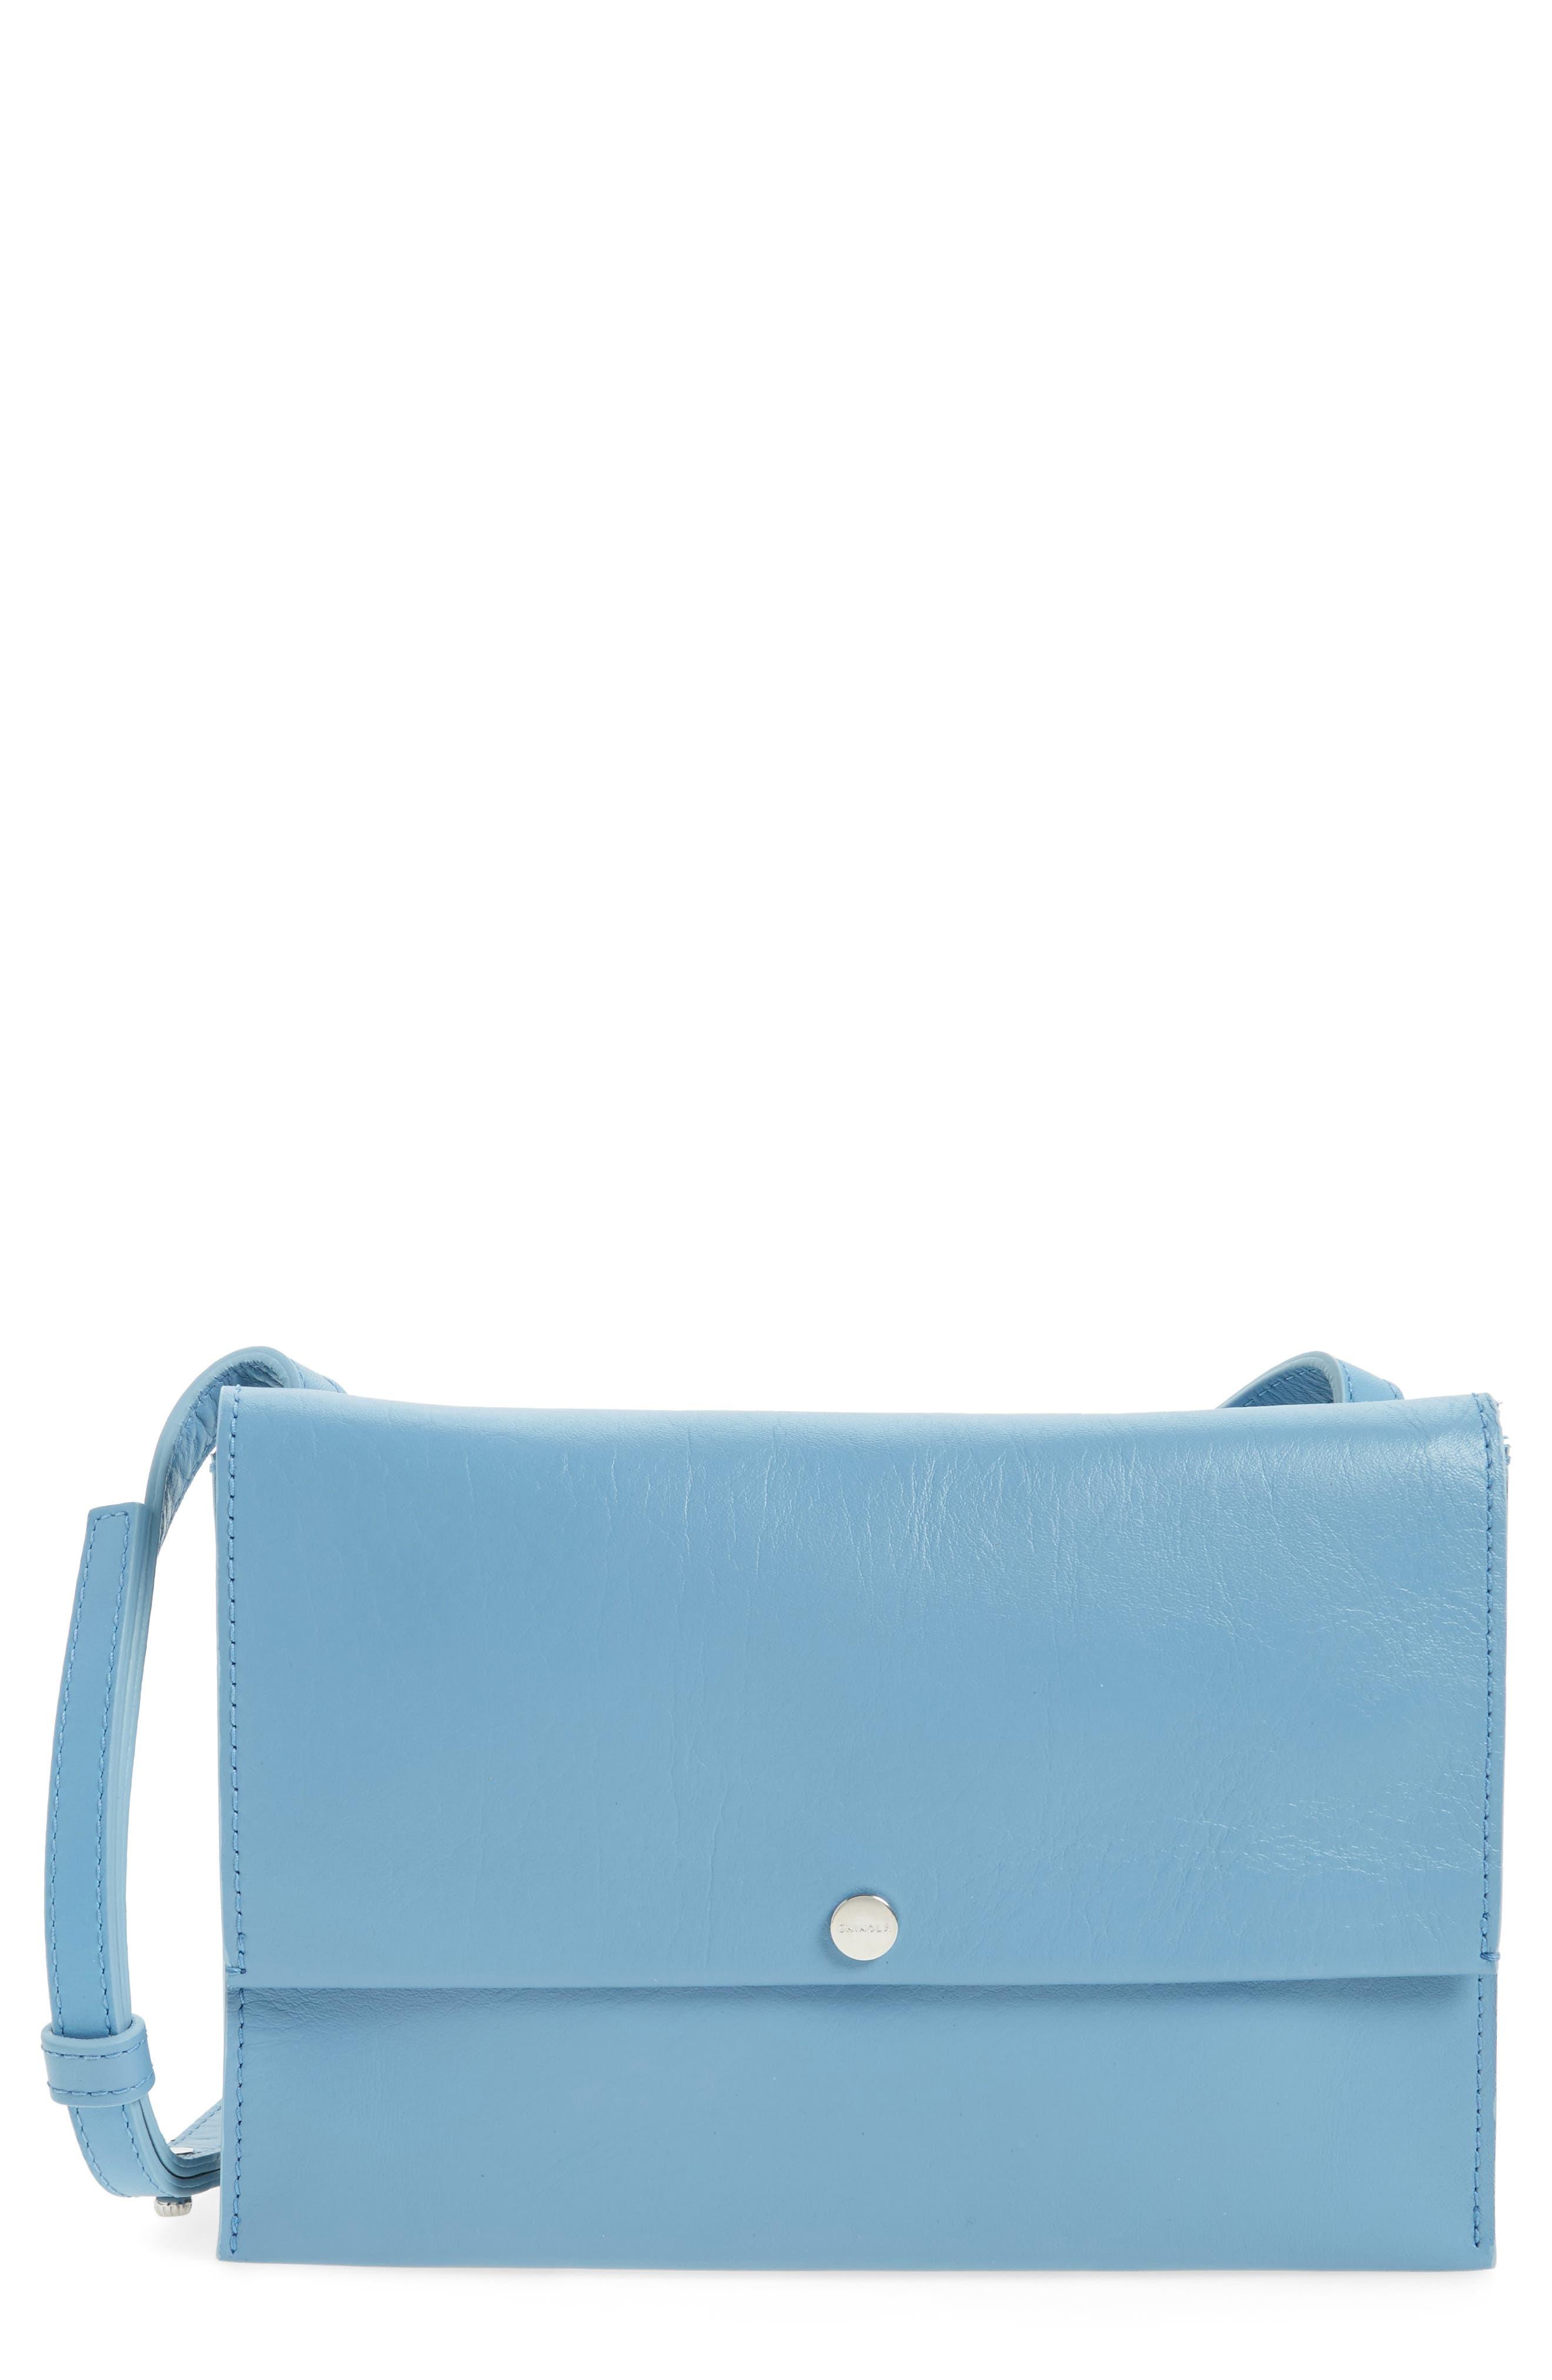 SHINOLA Crossbody Leather Bag